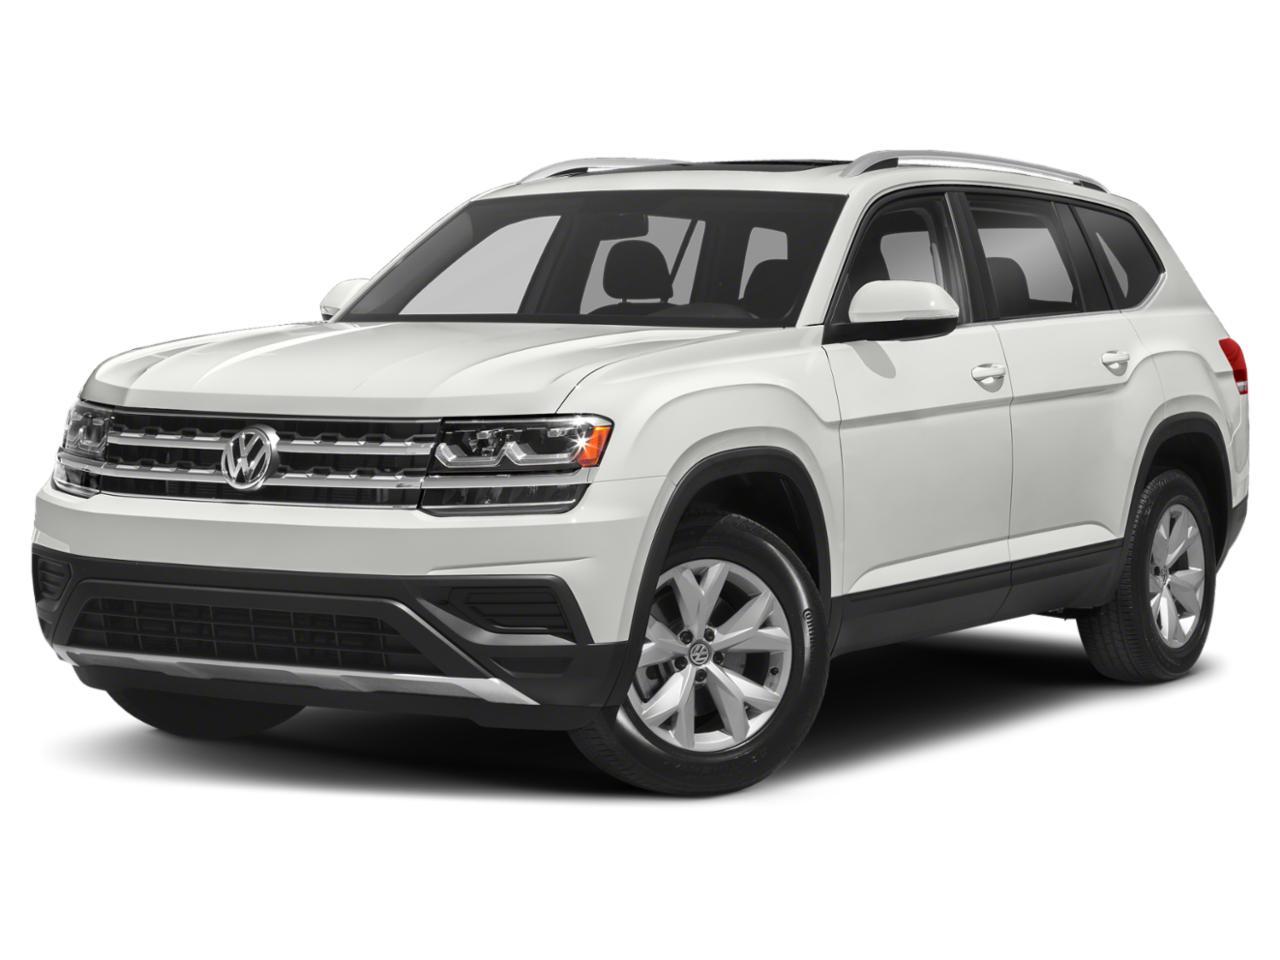 2019 Volkswagen Atlas Vehicle Photo in San Antonio, TX 78230